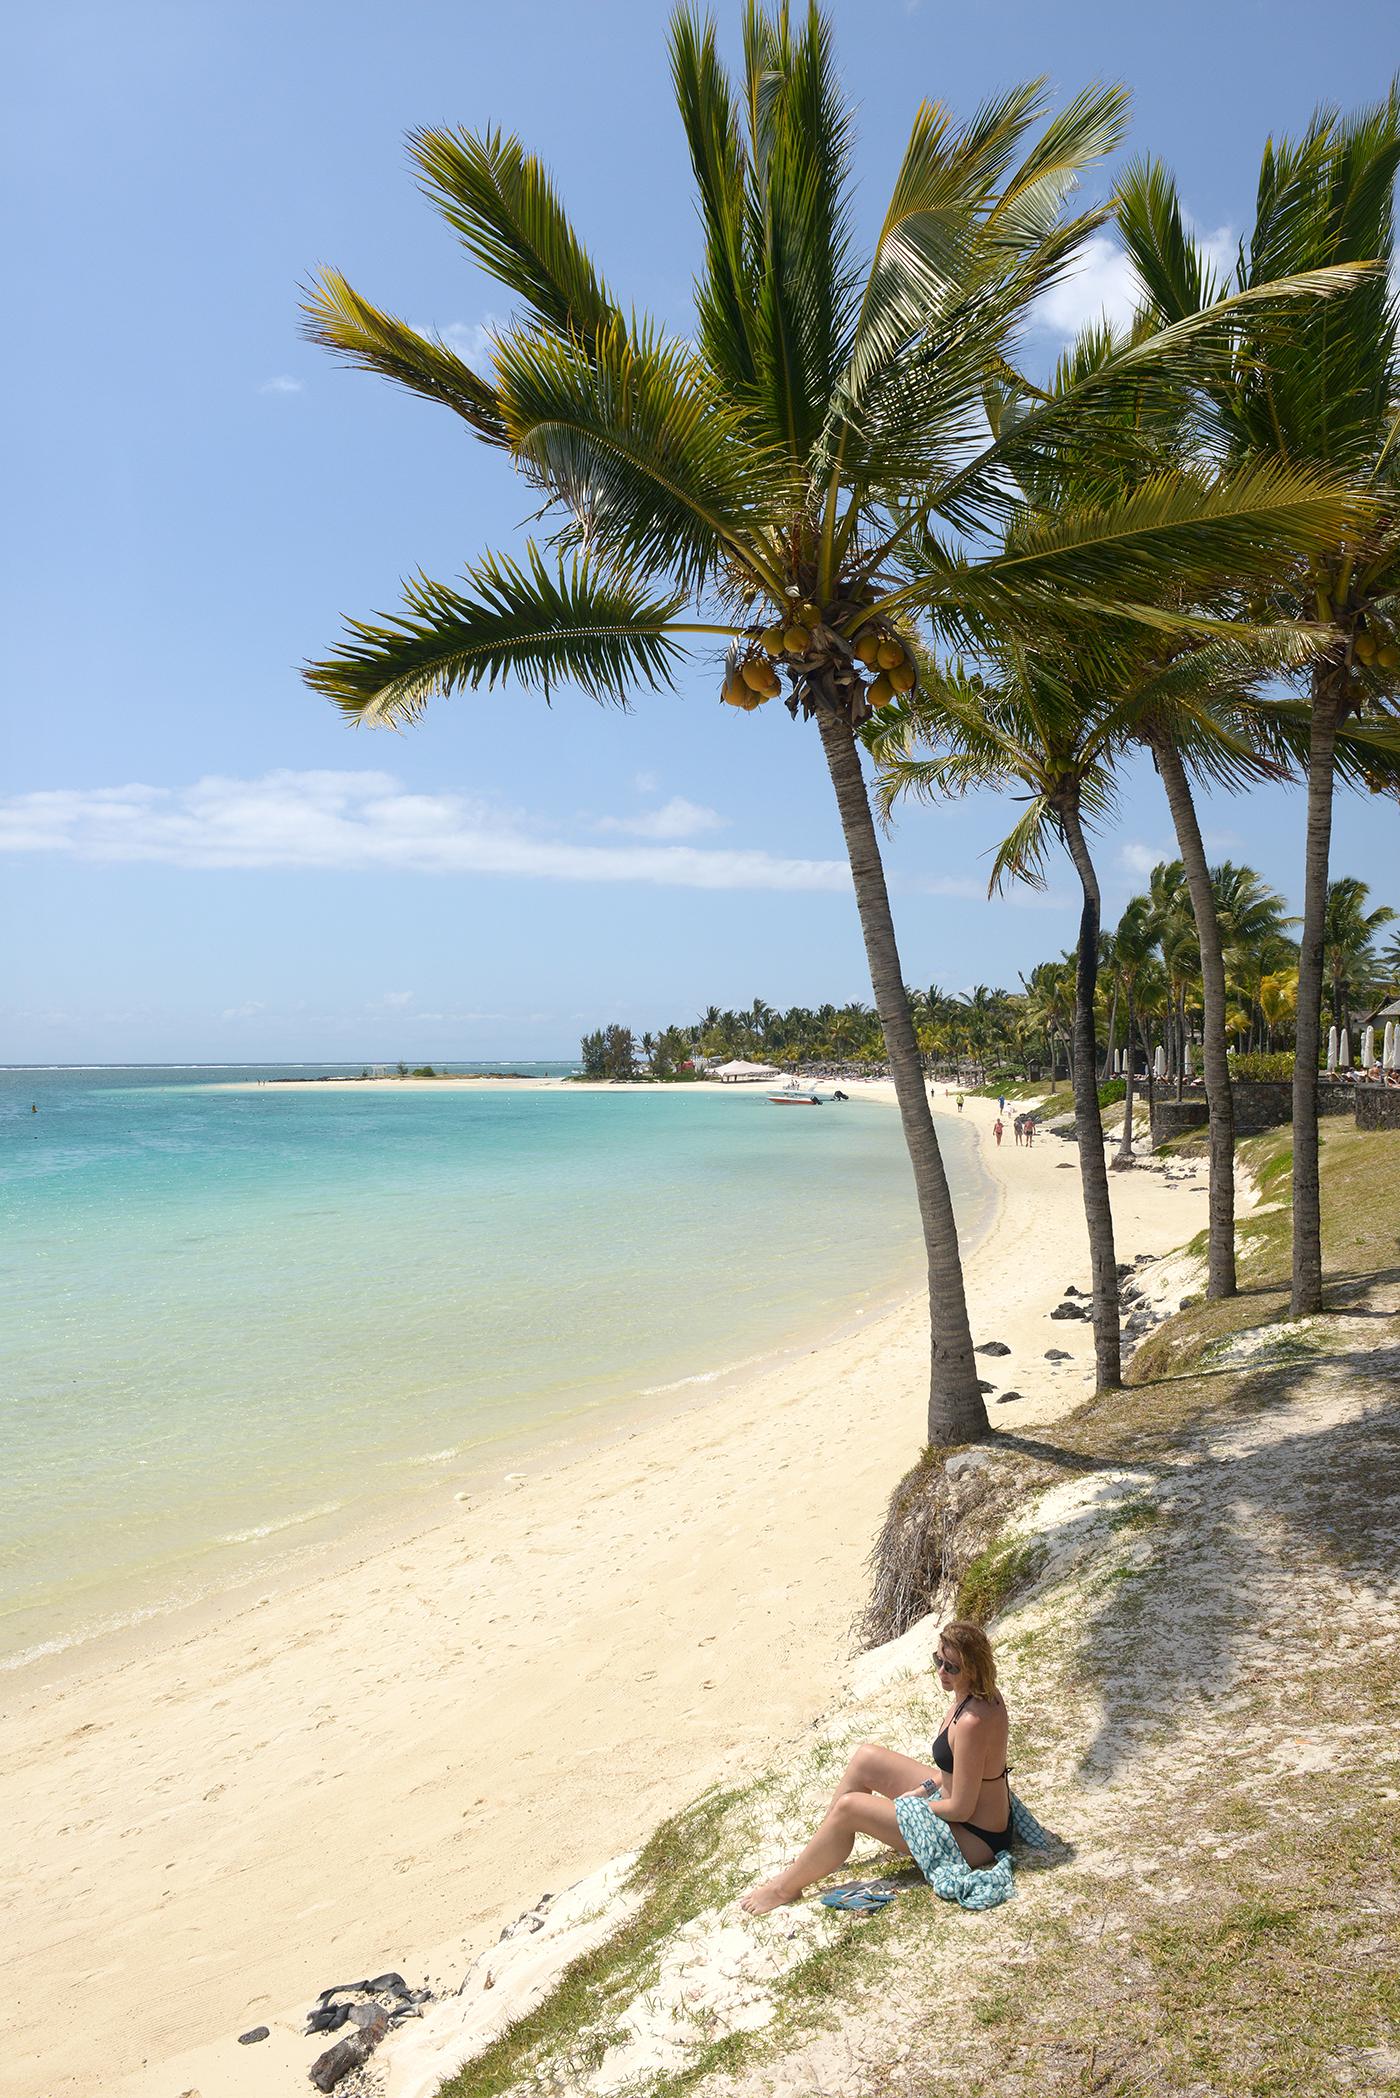 Mauritius, ranta, hiekka, palmu, matkailu, matka, matkablogi